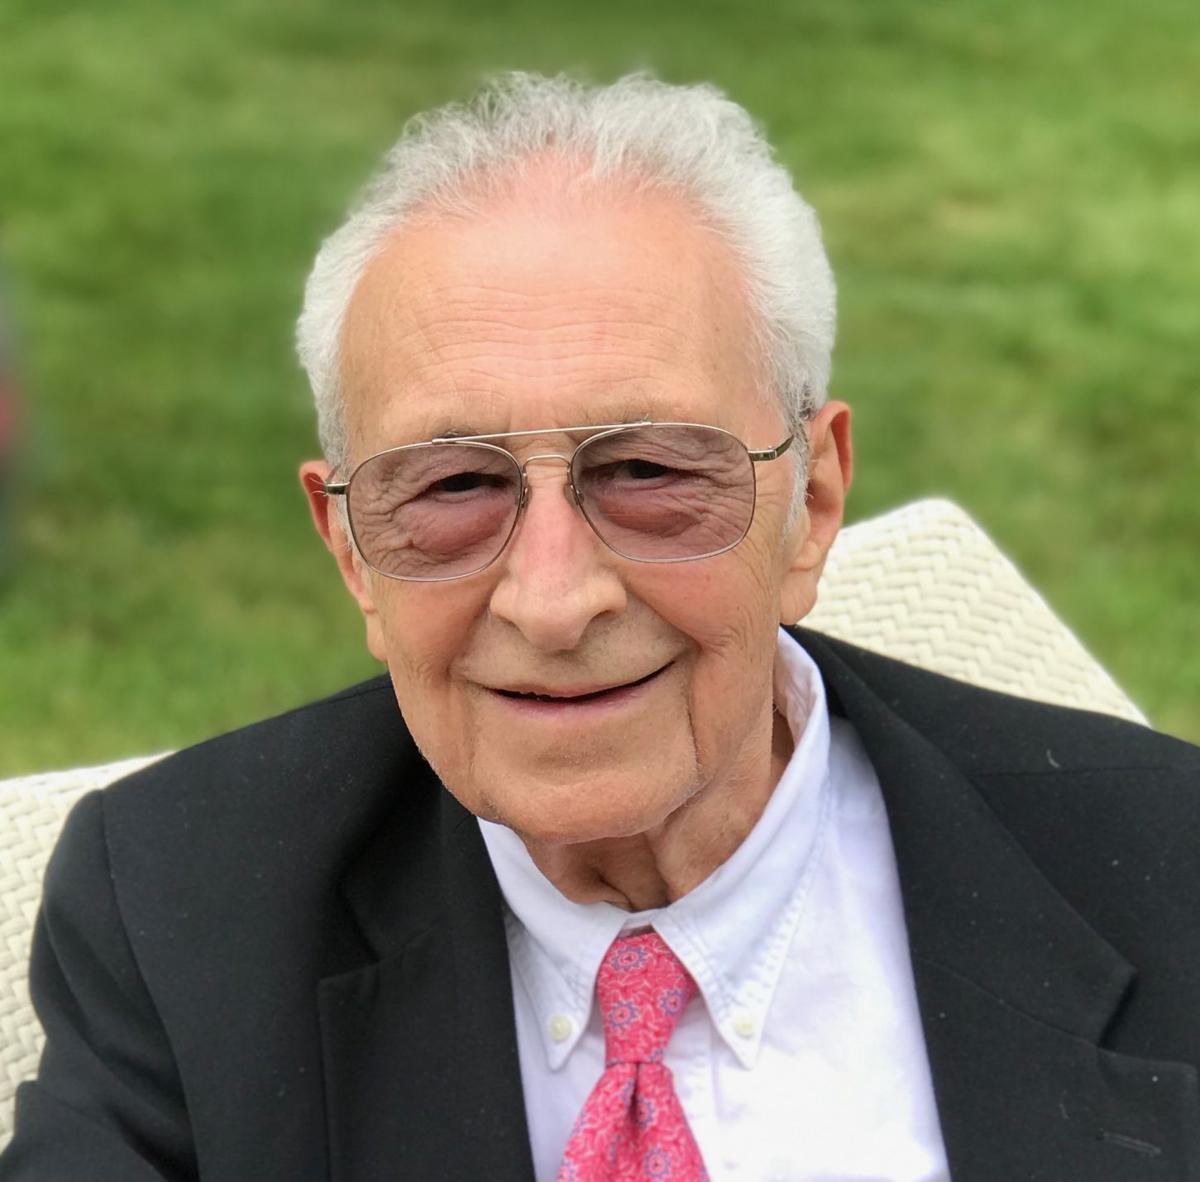 Stanley J. Emerling